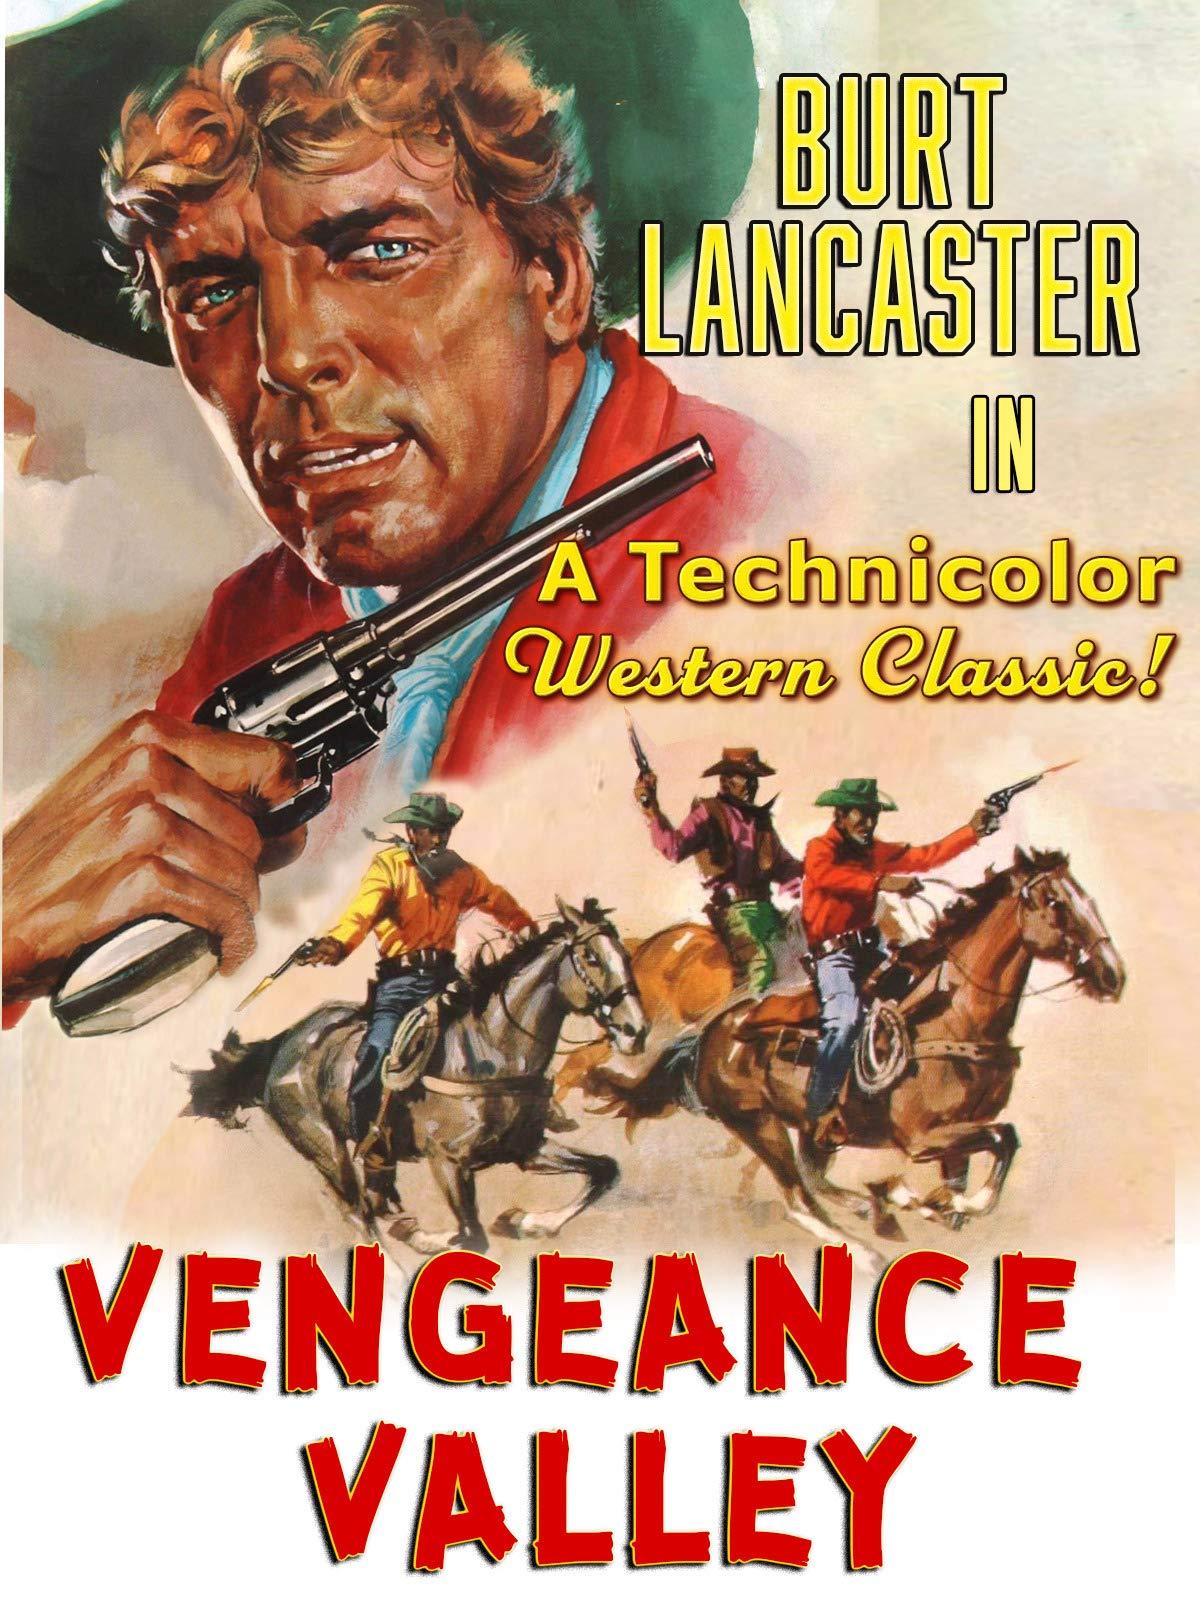 Burt Lancaster In Vengeance Valley - A Technicolor Western Classic!